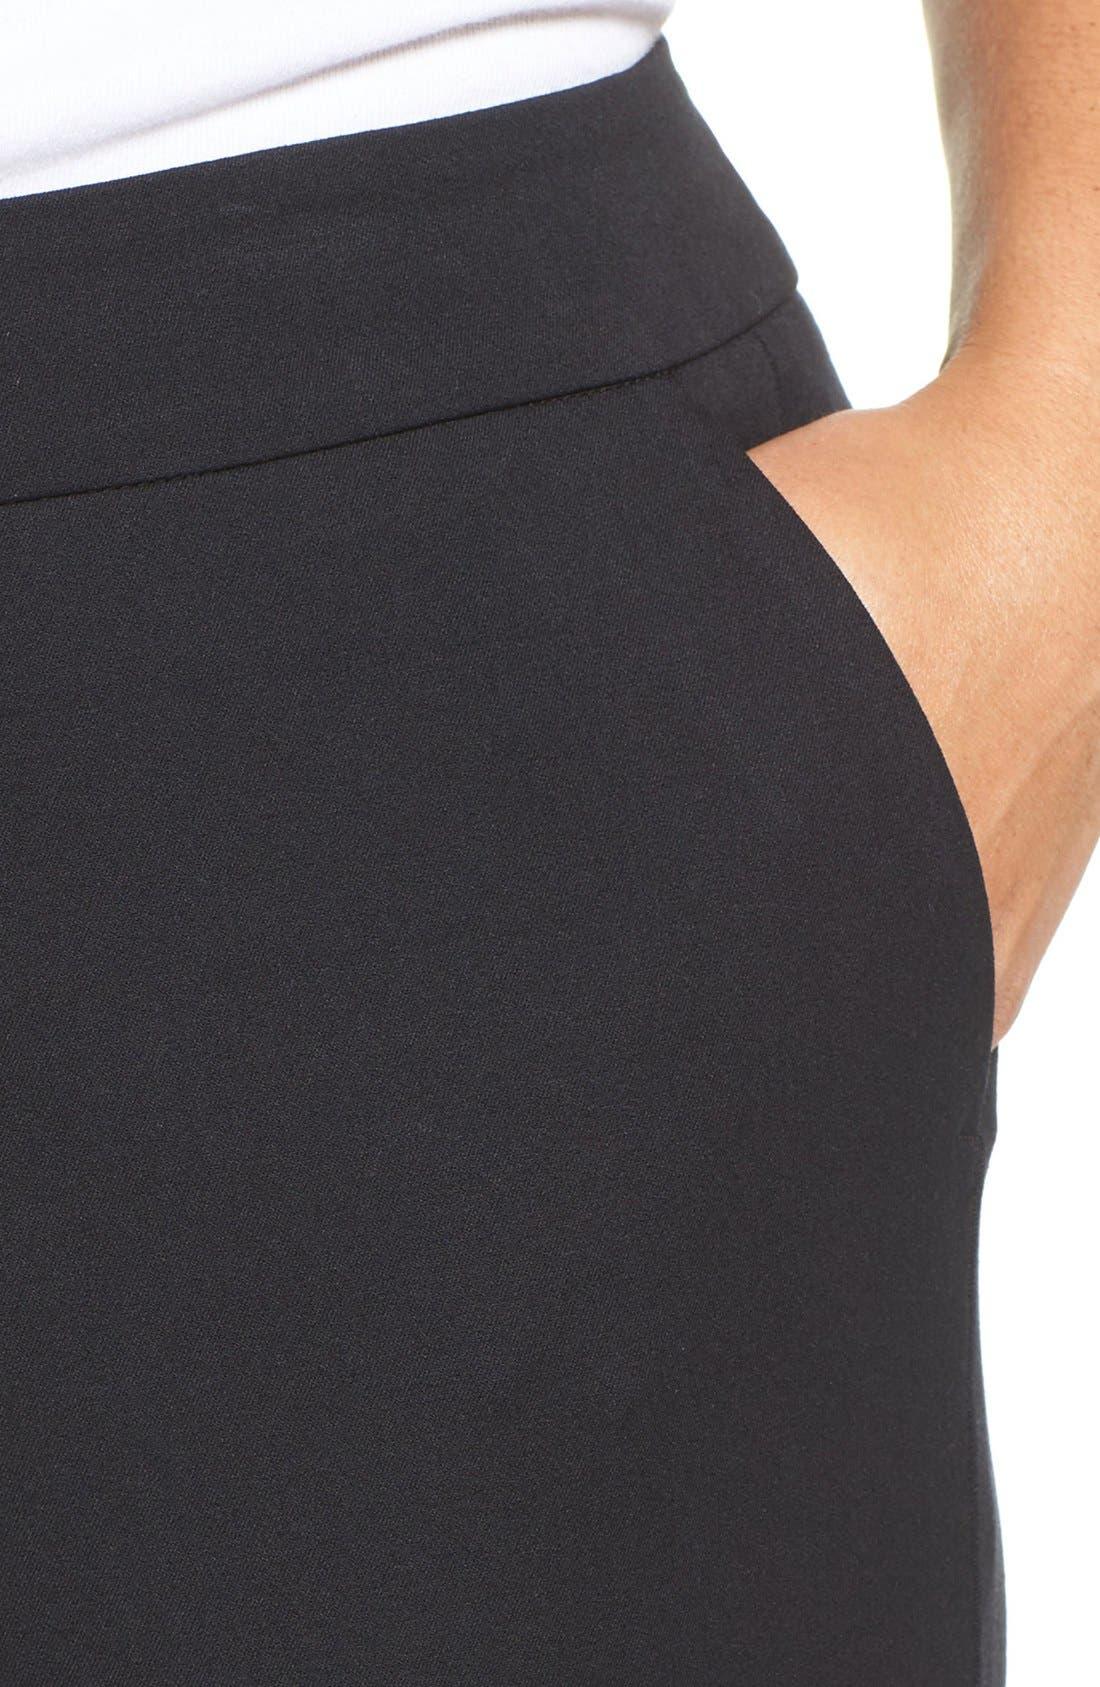 SEJOUR, Straight Leg Ankle Pants, Alternate thumbnail 11, color, BLACK